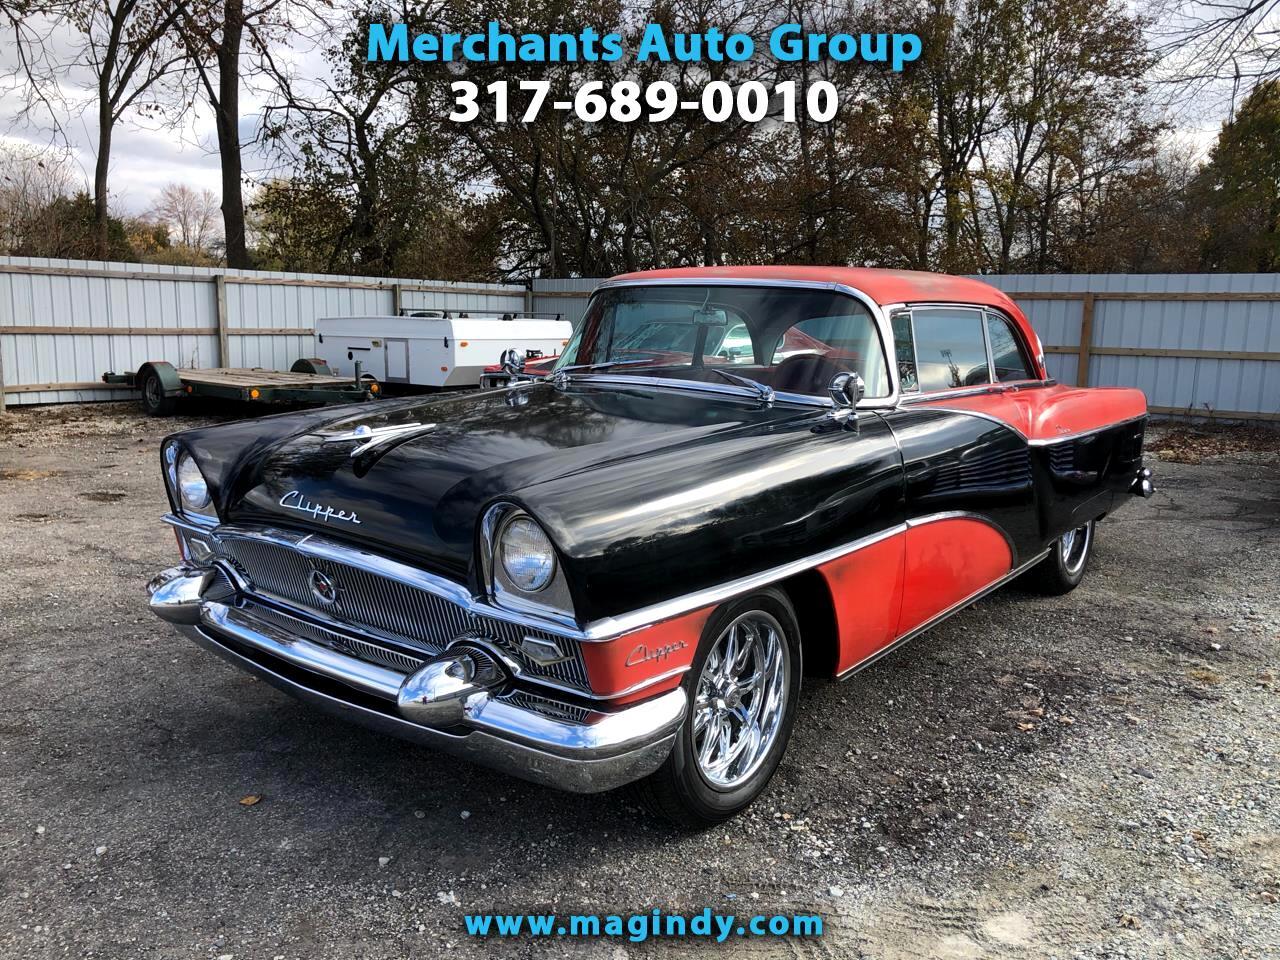 1955 Packard Clipper HT 2-door Coupe